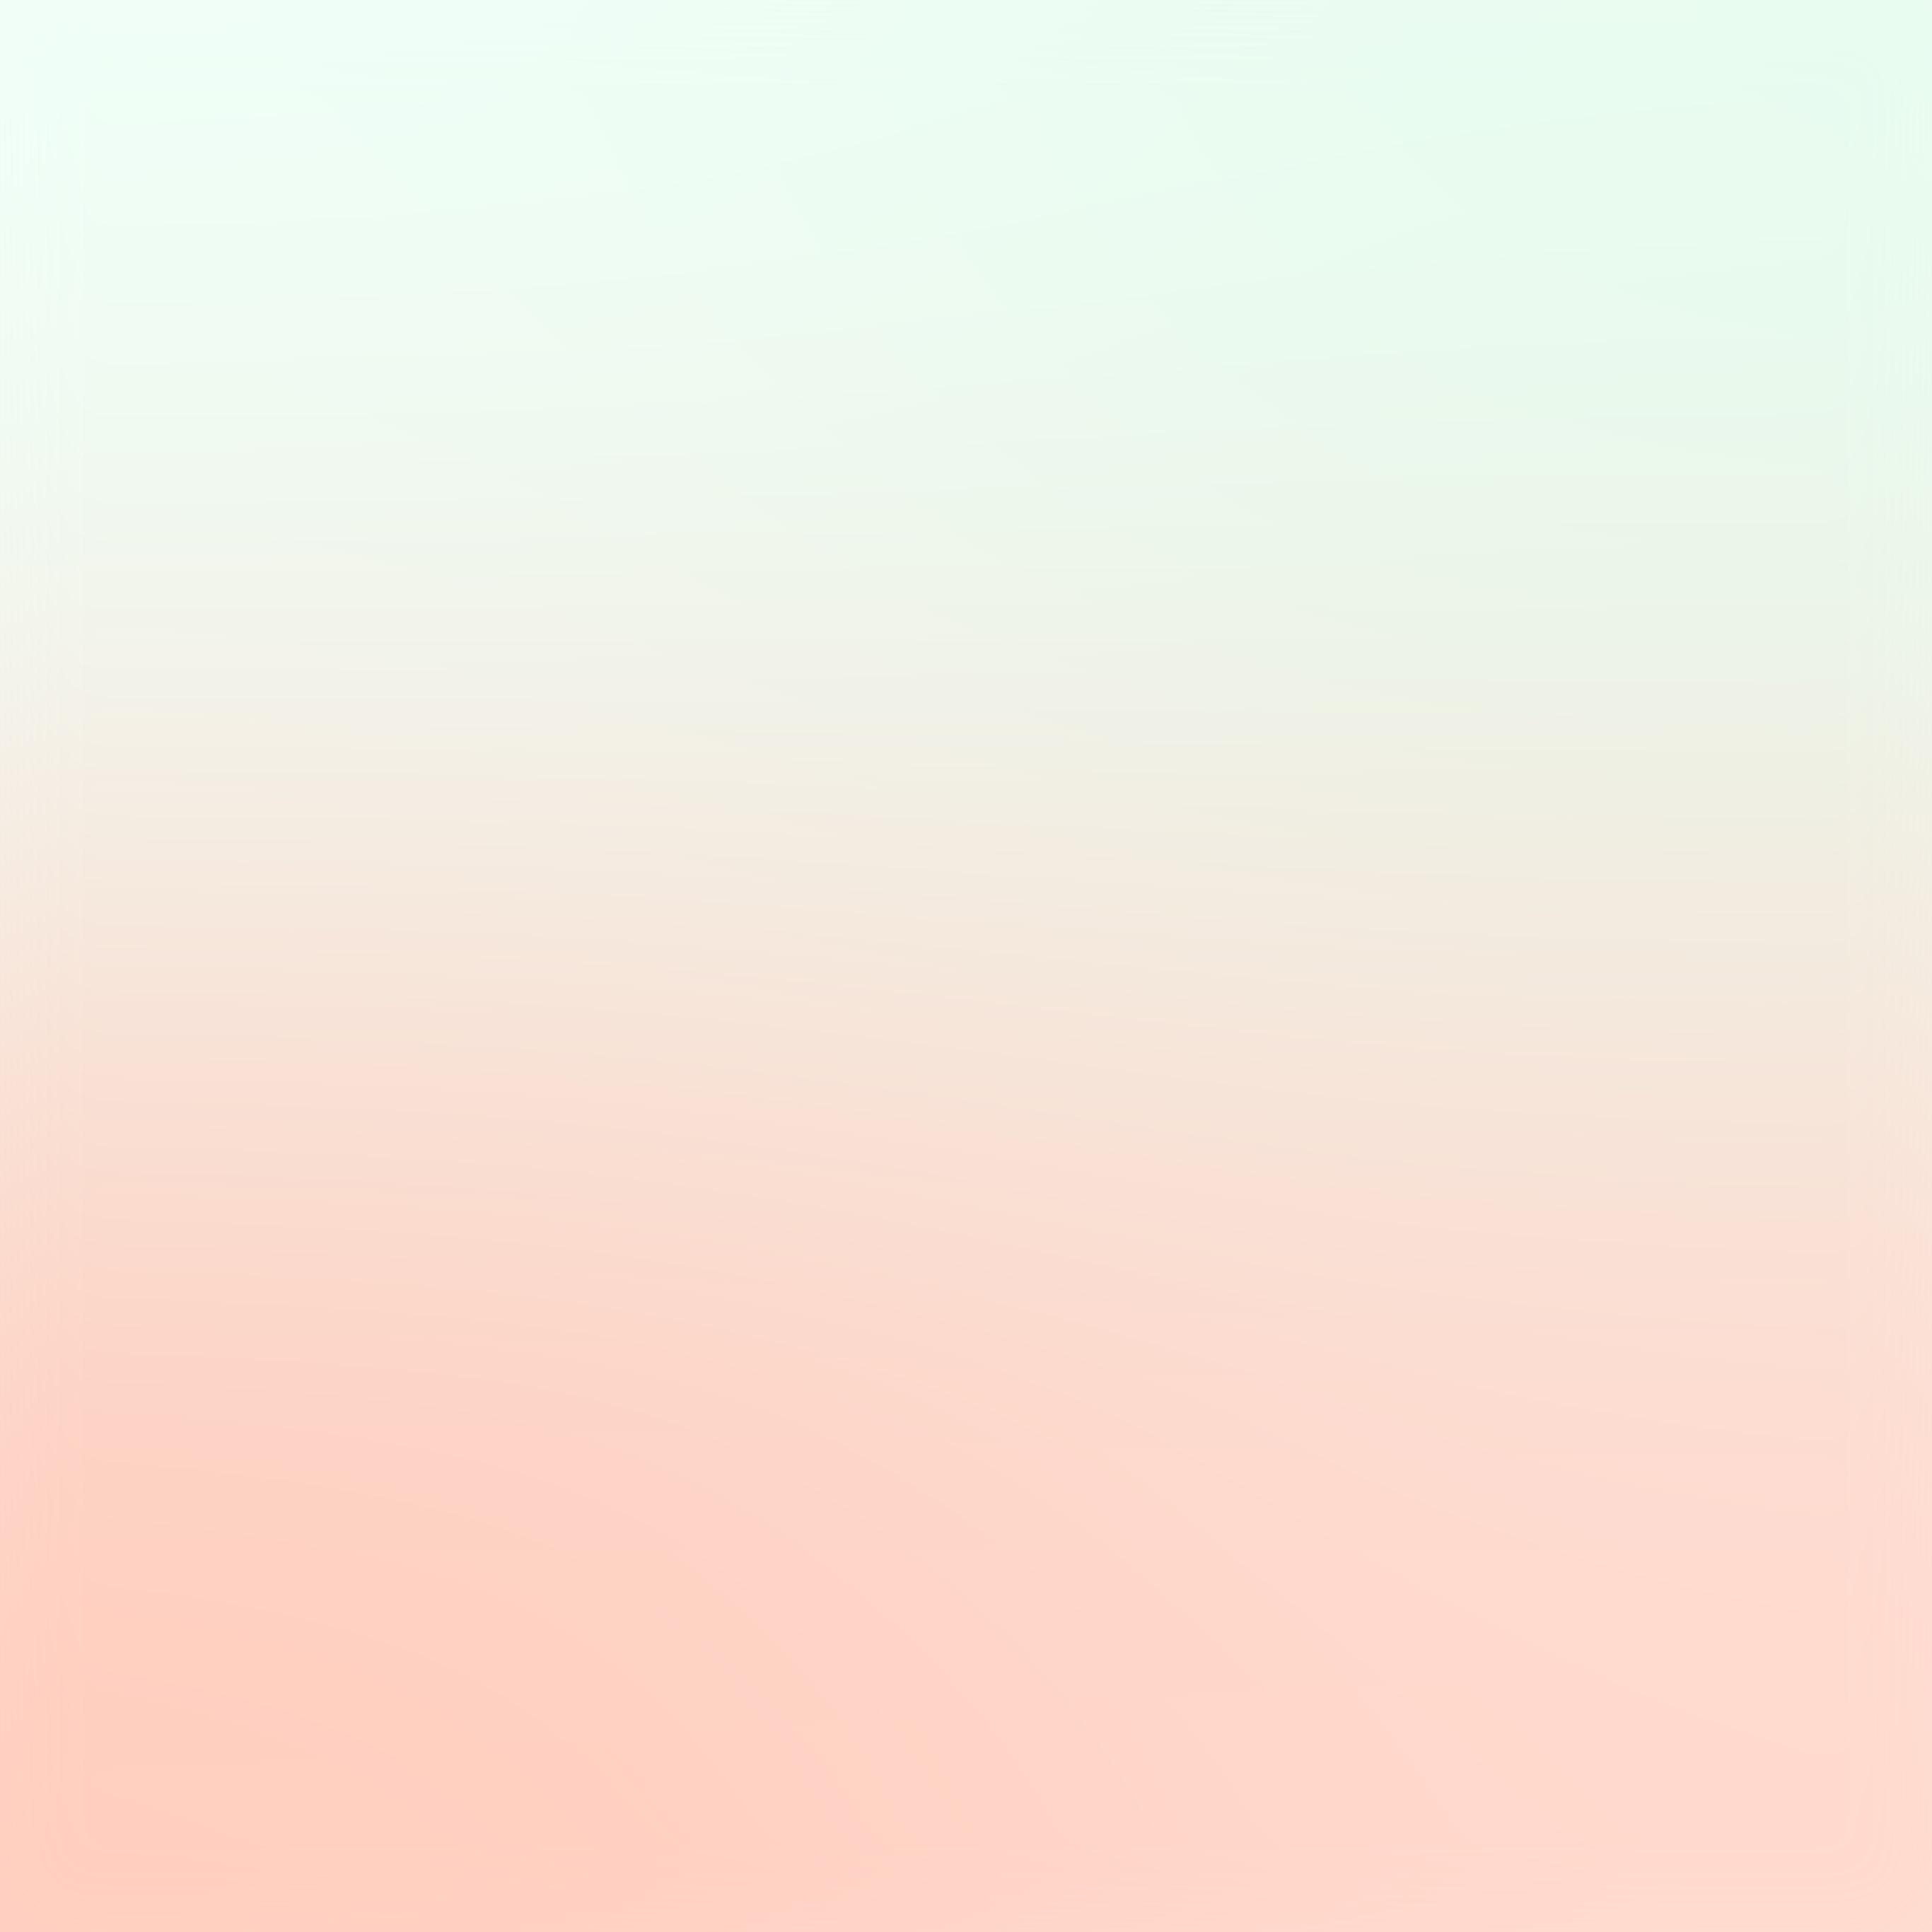 Sk10 Soft Pastel Sky Blur Gradation Wallpaper